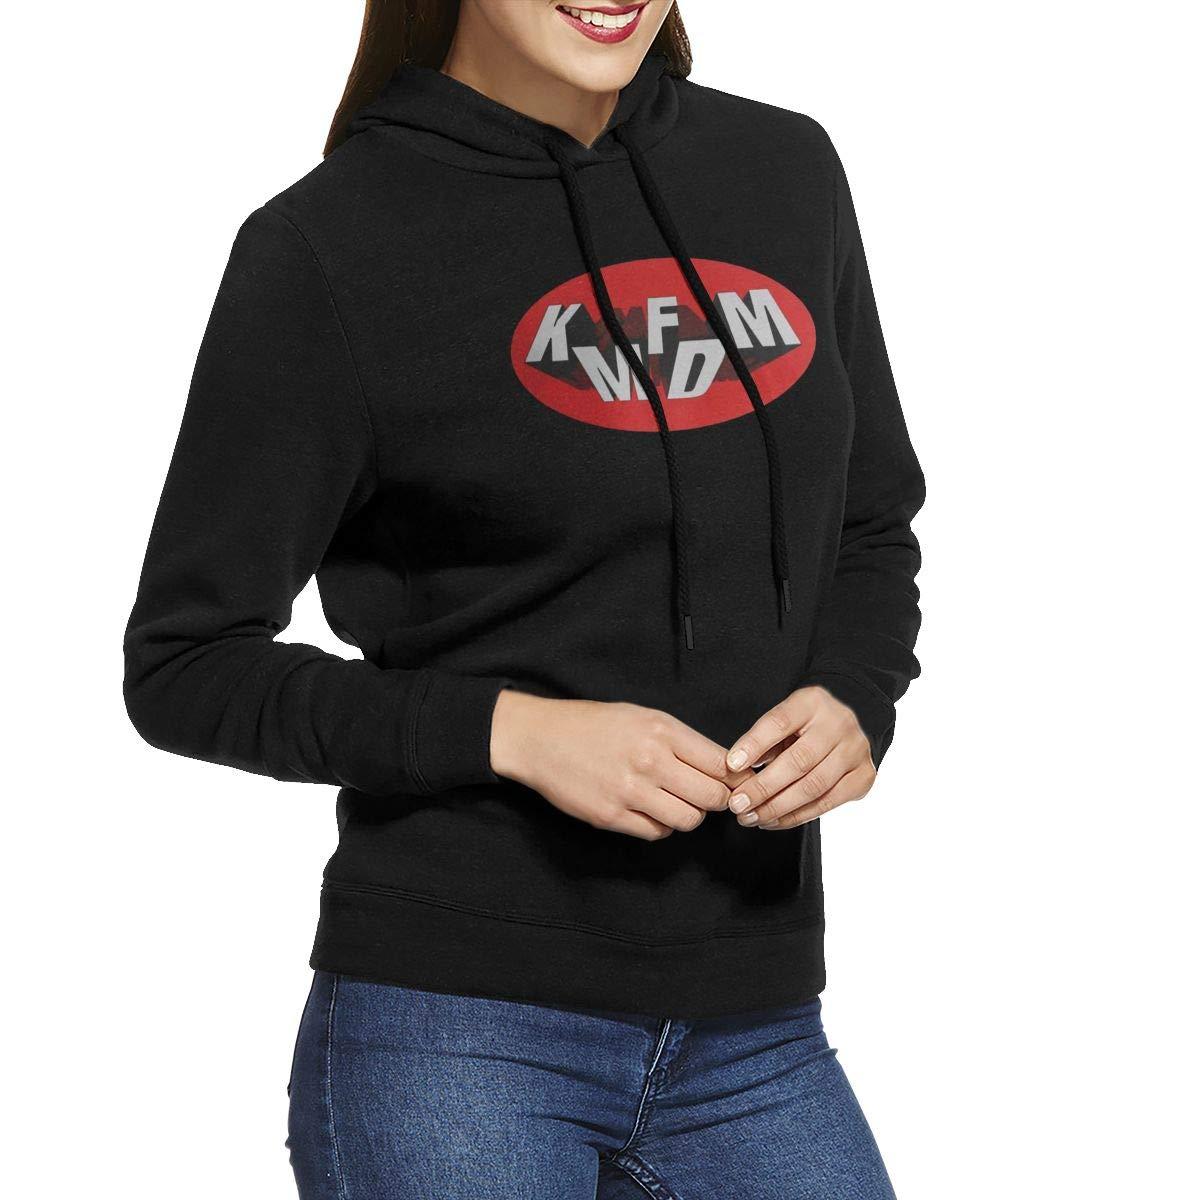 Dwghjvwer Womens KMFDM Logo Hoodie